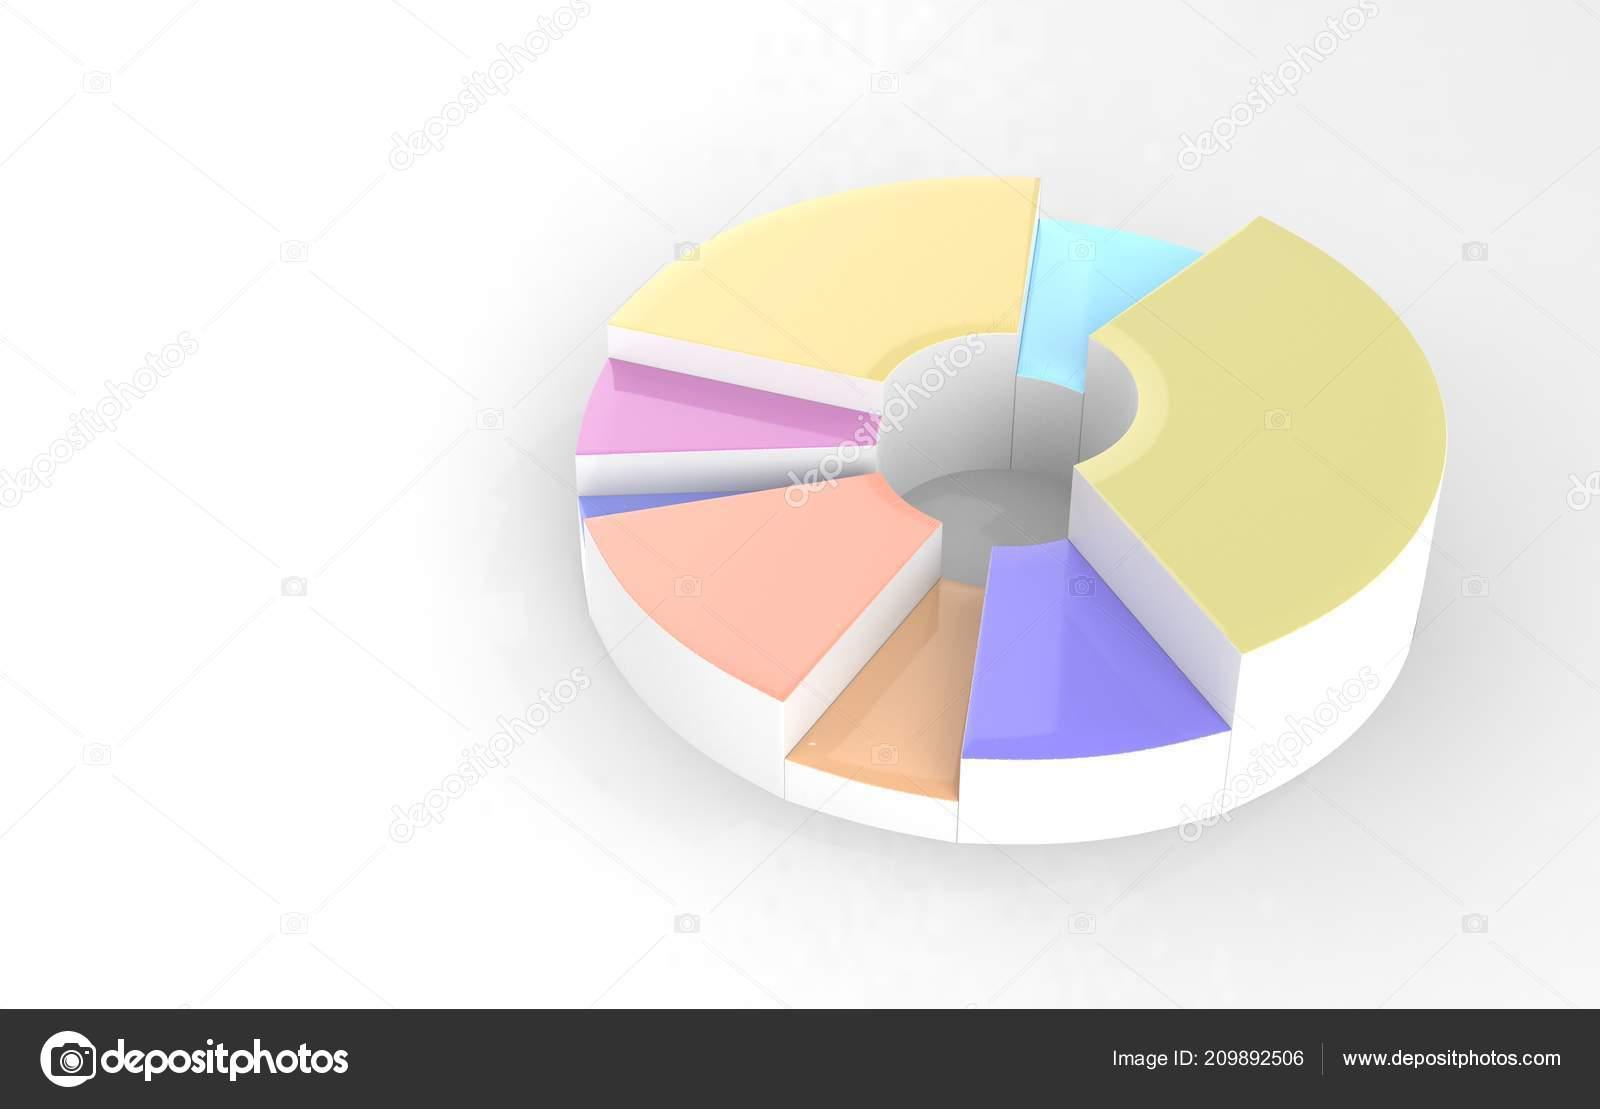 Info graphic colorful circle diagram 3d illustration stock photo info graphic colorful circle diagram 3d illustration fotografia de stock ccuart Images